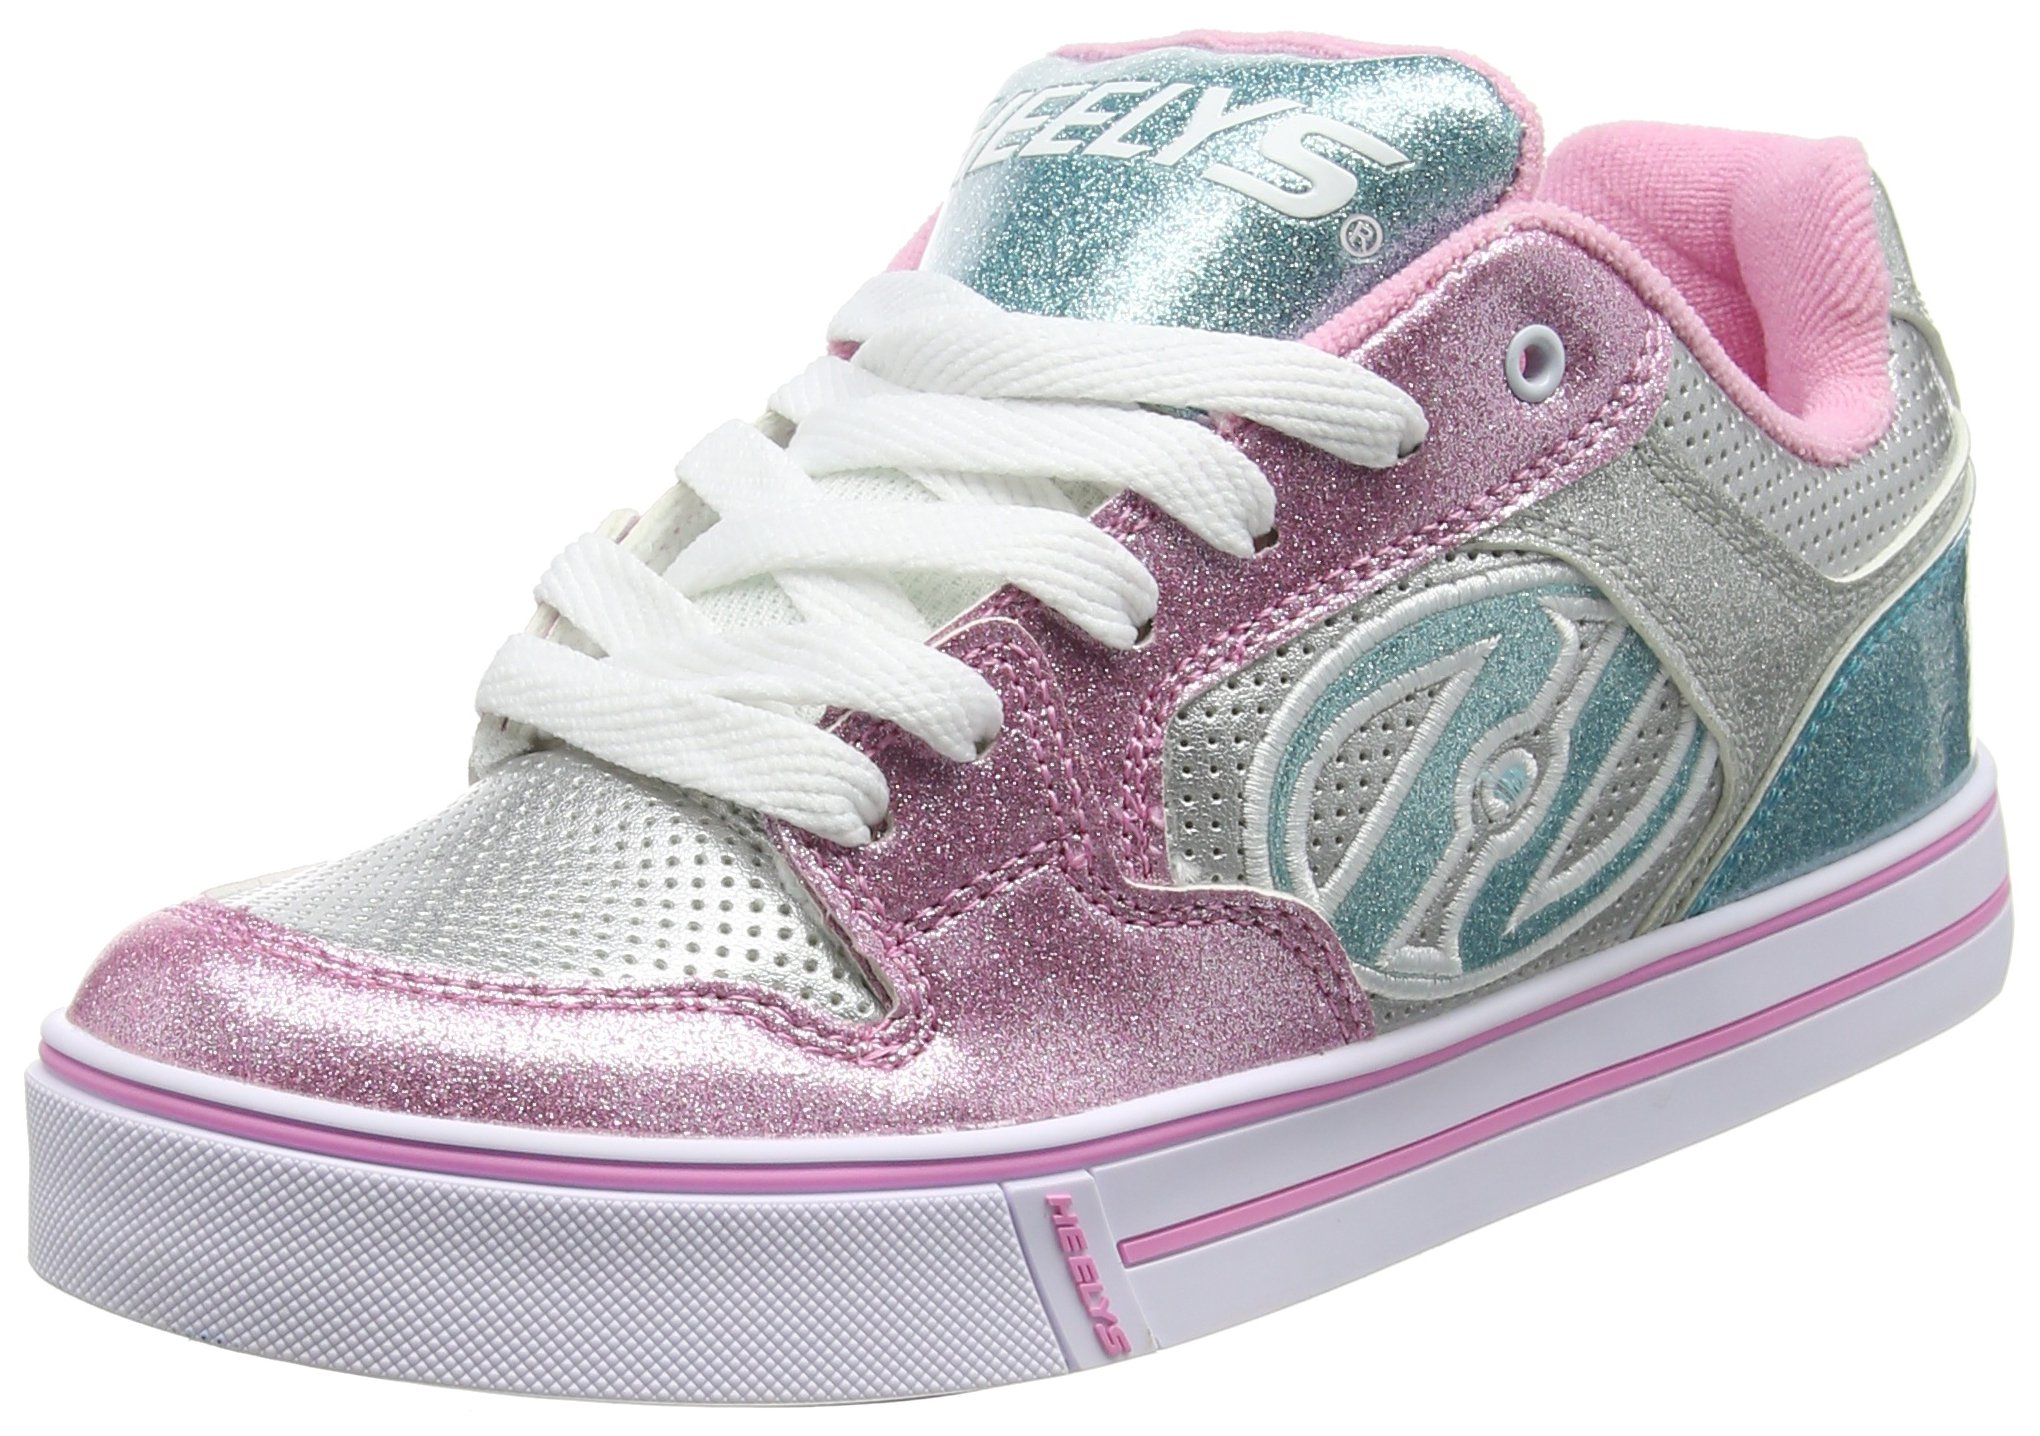 Heelys Girl's Motion Plus (Little Kid/Big Kid/Adult) Silver/Pink/Blue/Glitter Shoe by Heelys (Image #1)